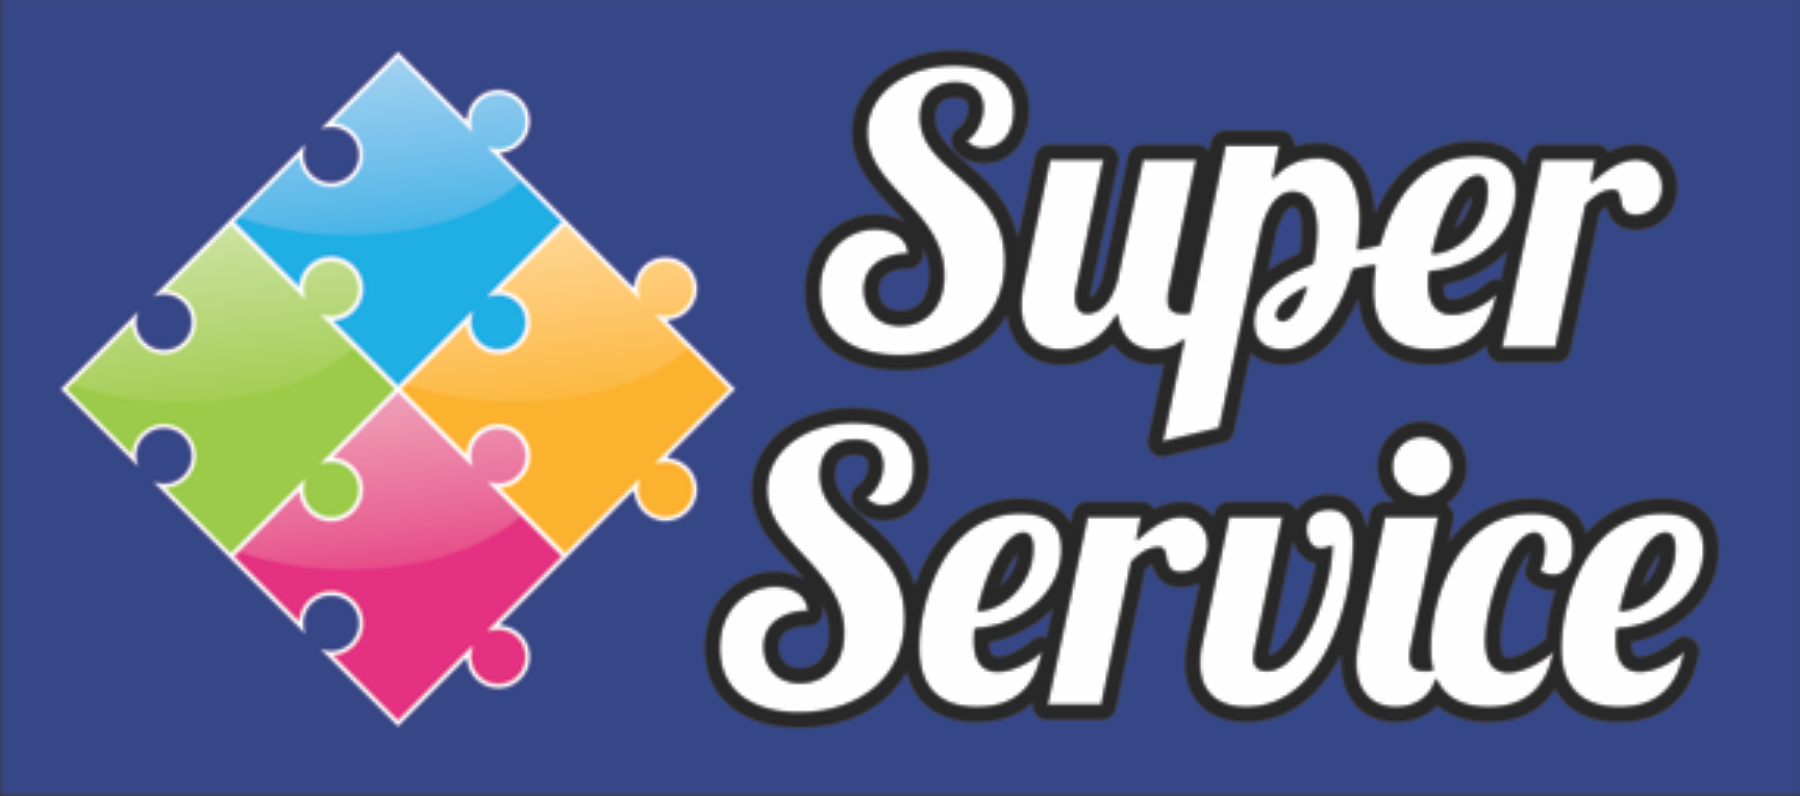 Super Service Rubber Stamp and Sign Ltd